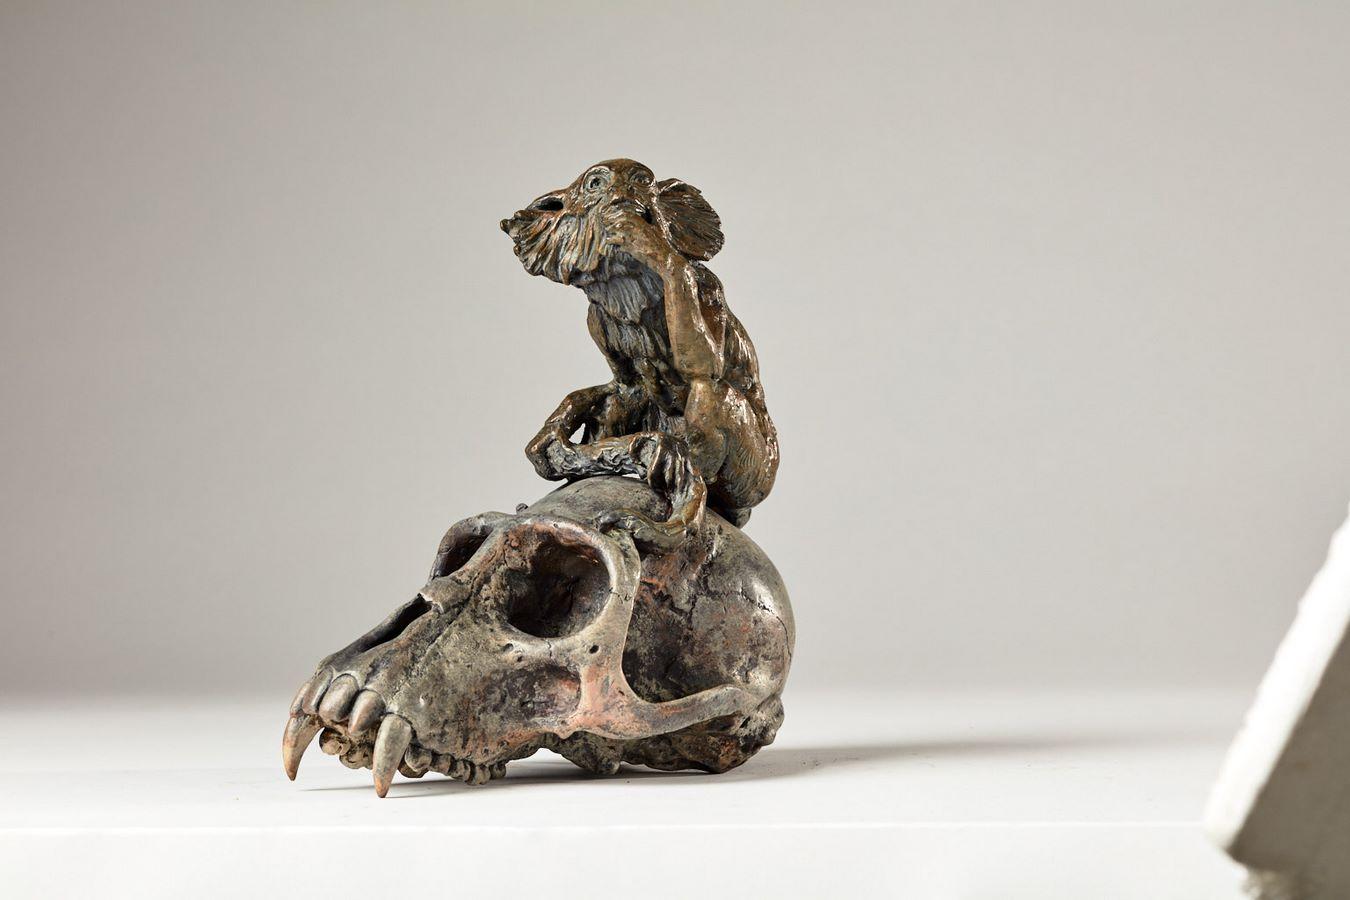 Kasper sculpteur _Ouistiti sur crâne de singe_ bronze